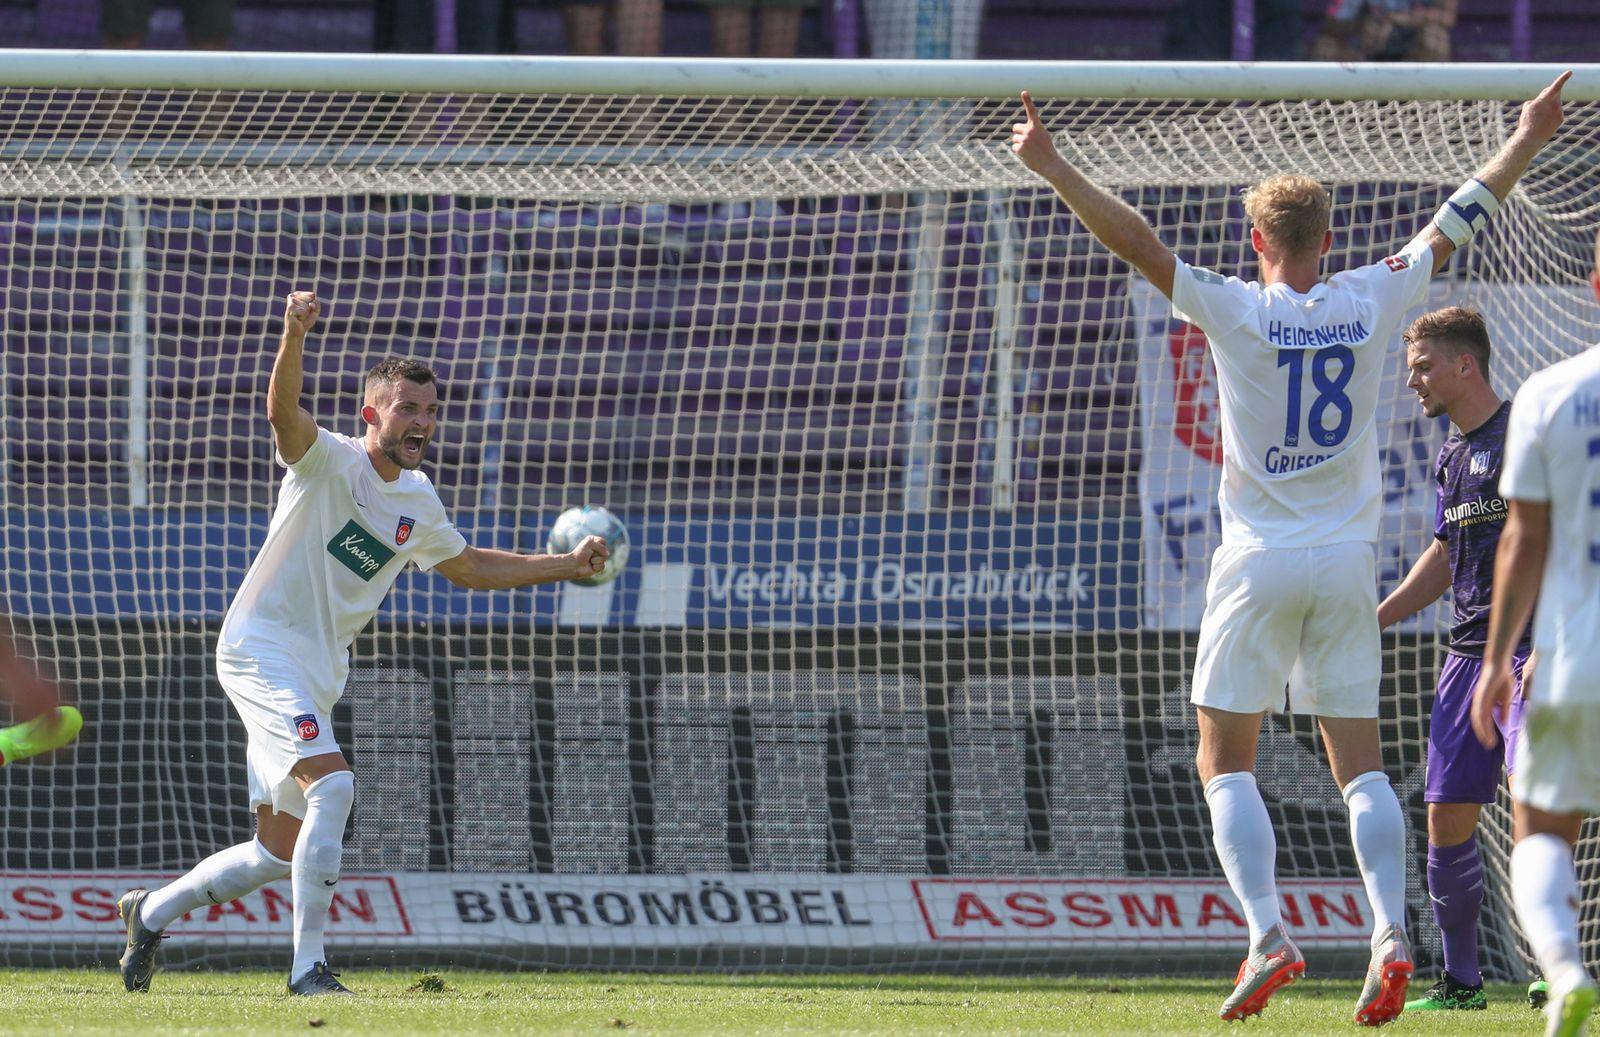 VfL Osnabrück - 1. FC Heidenheim